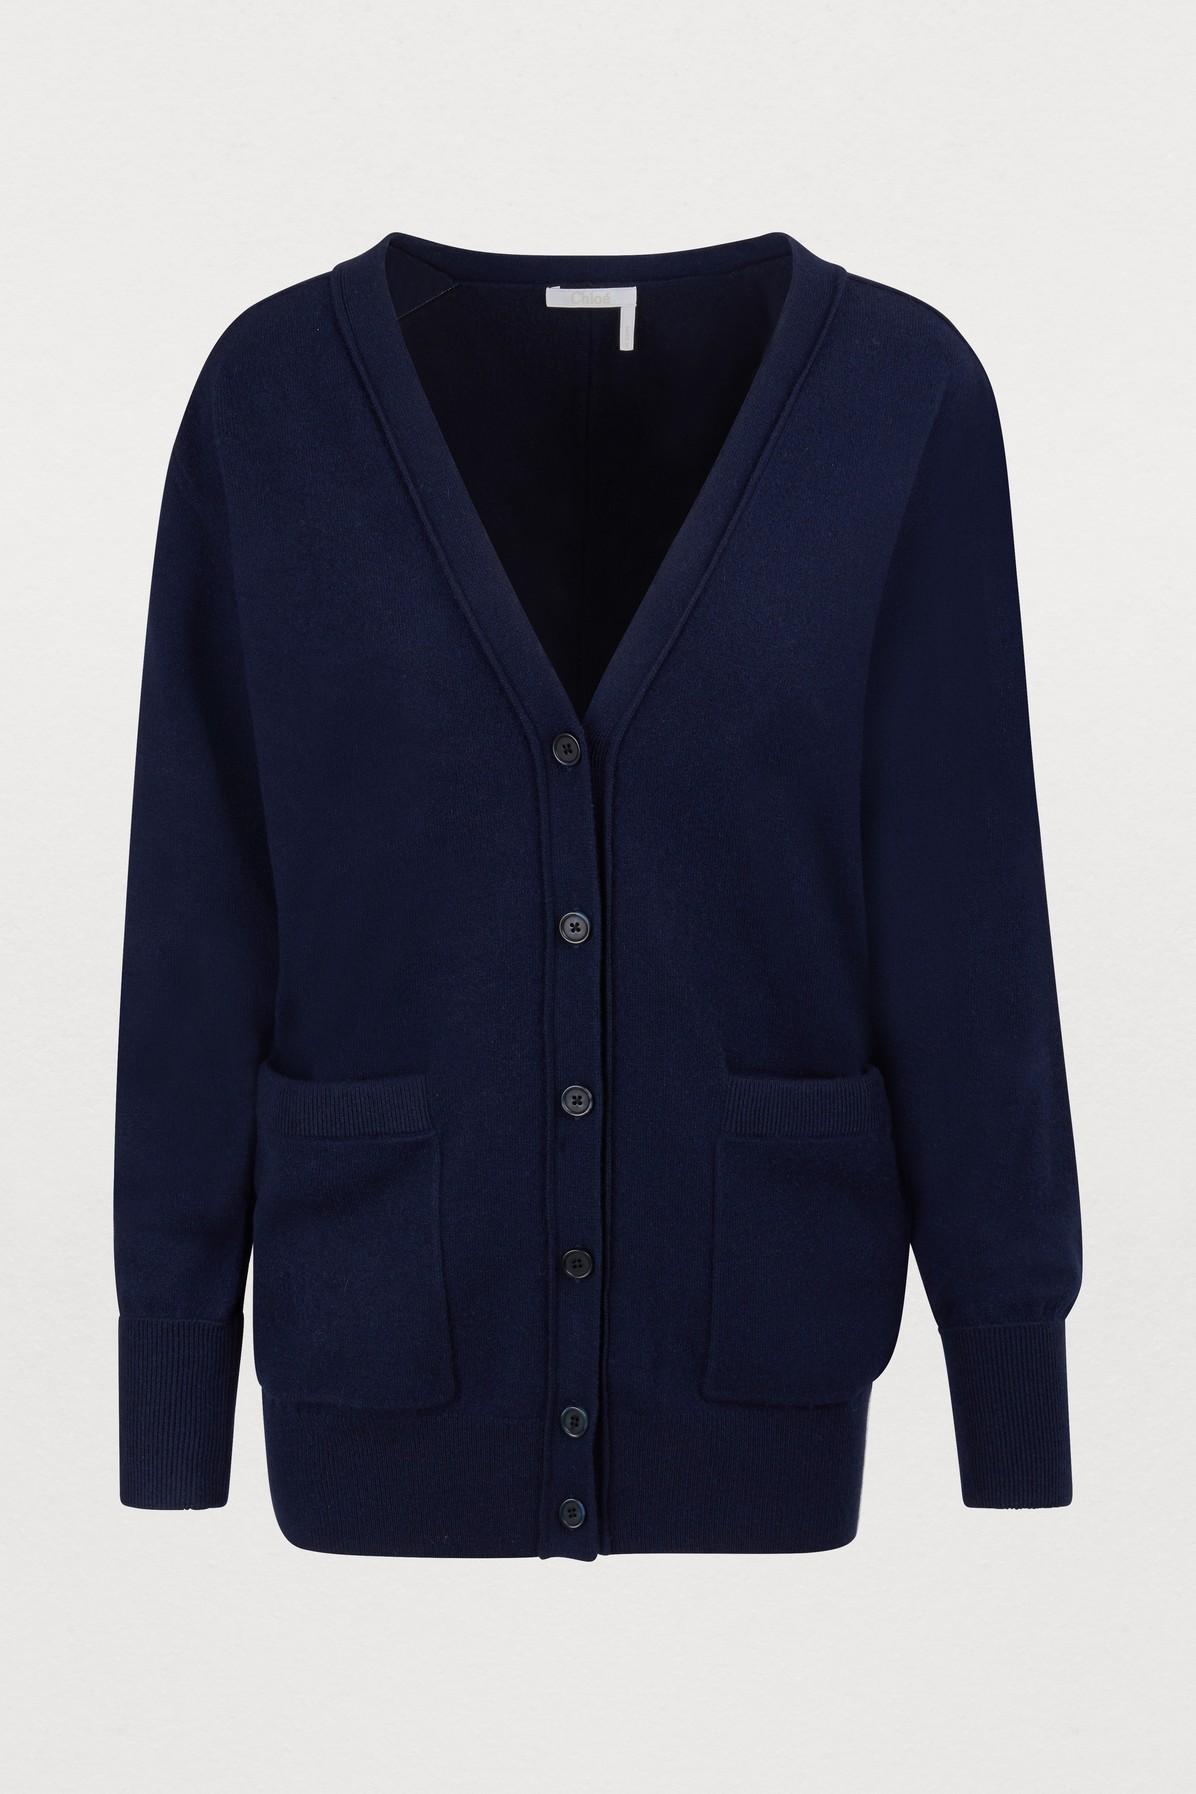 b38d23cc028268 ChloÉ Cashmere Cardigan In Evening Blue | ModeSens